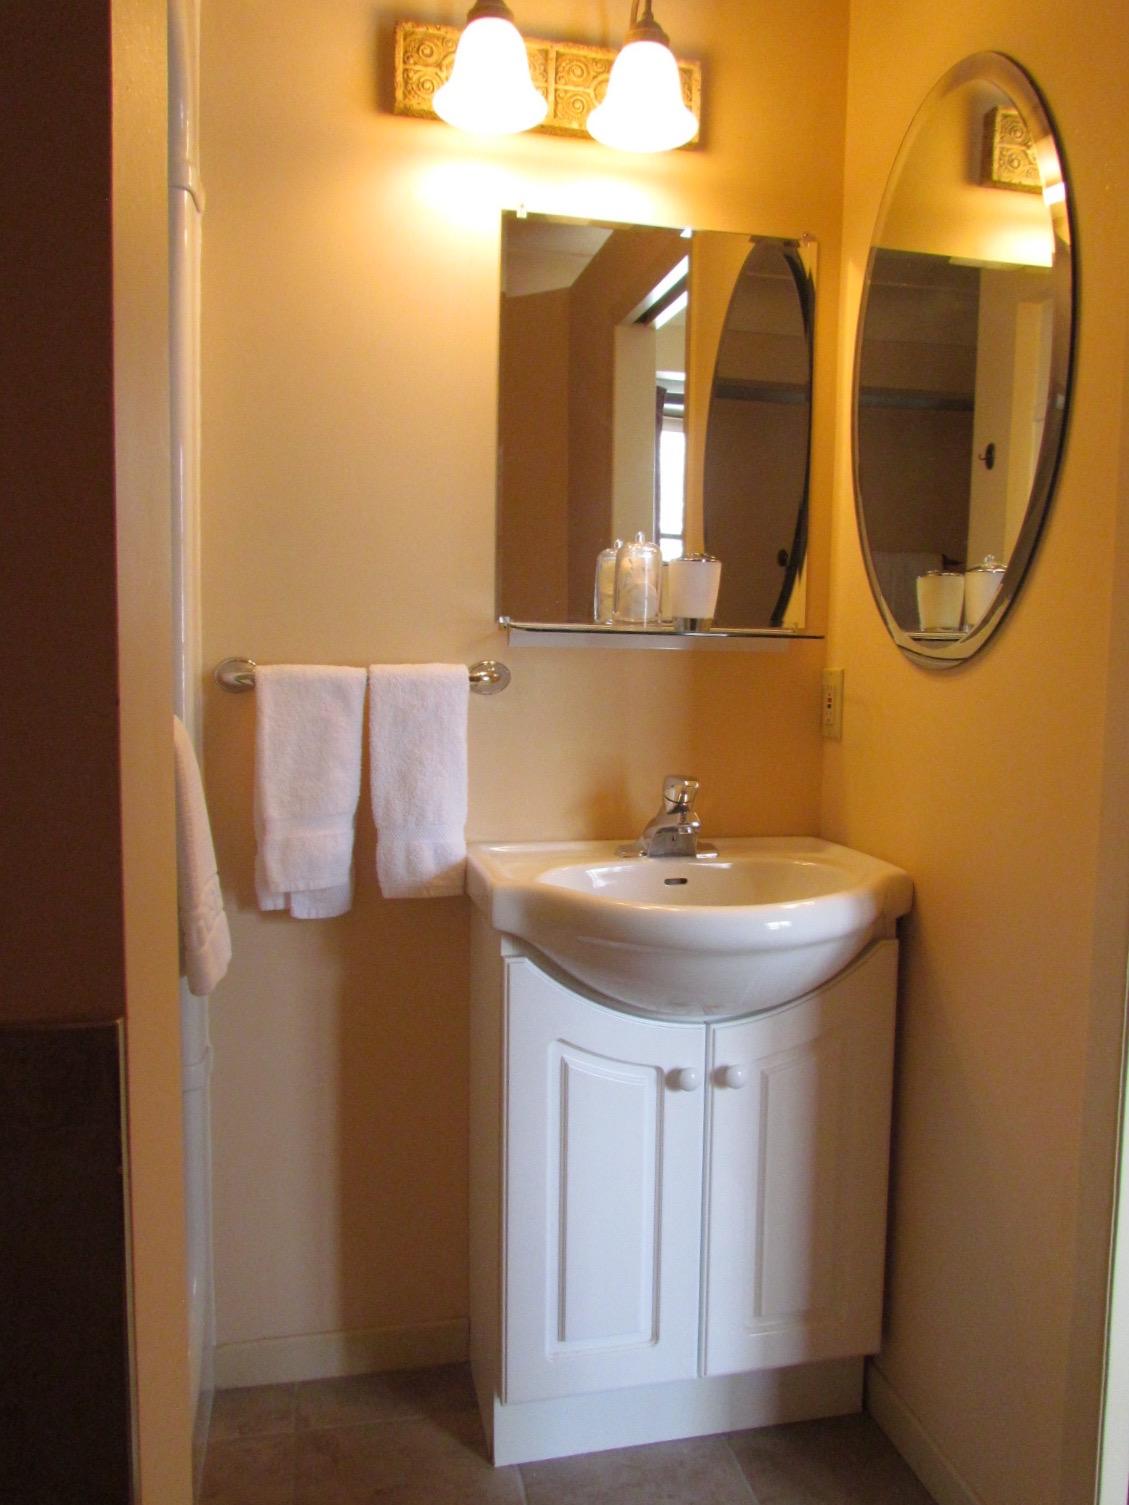 bathroom mirror bnb b&b